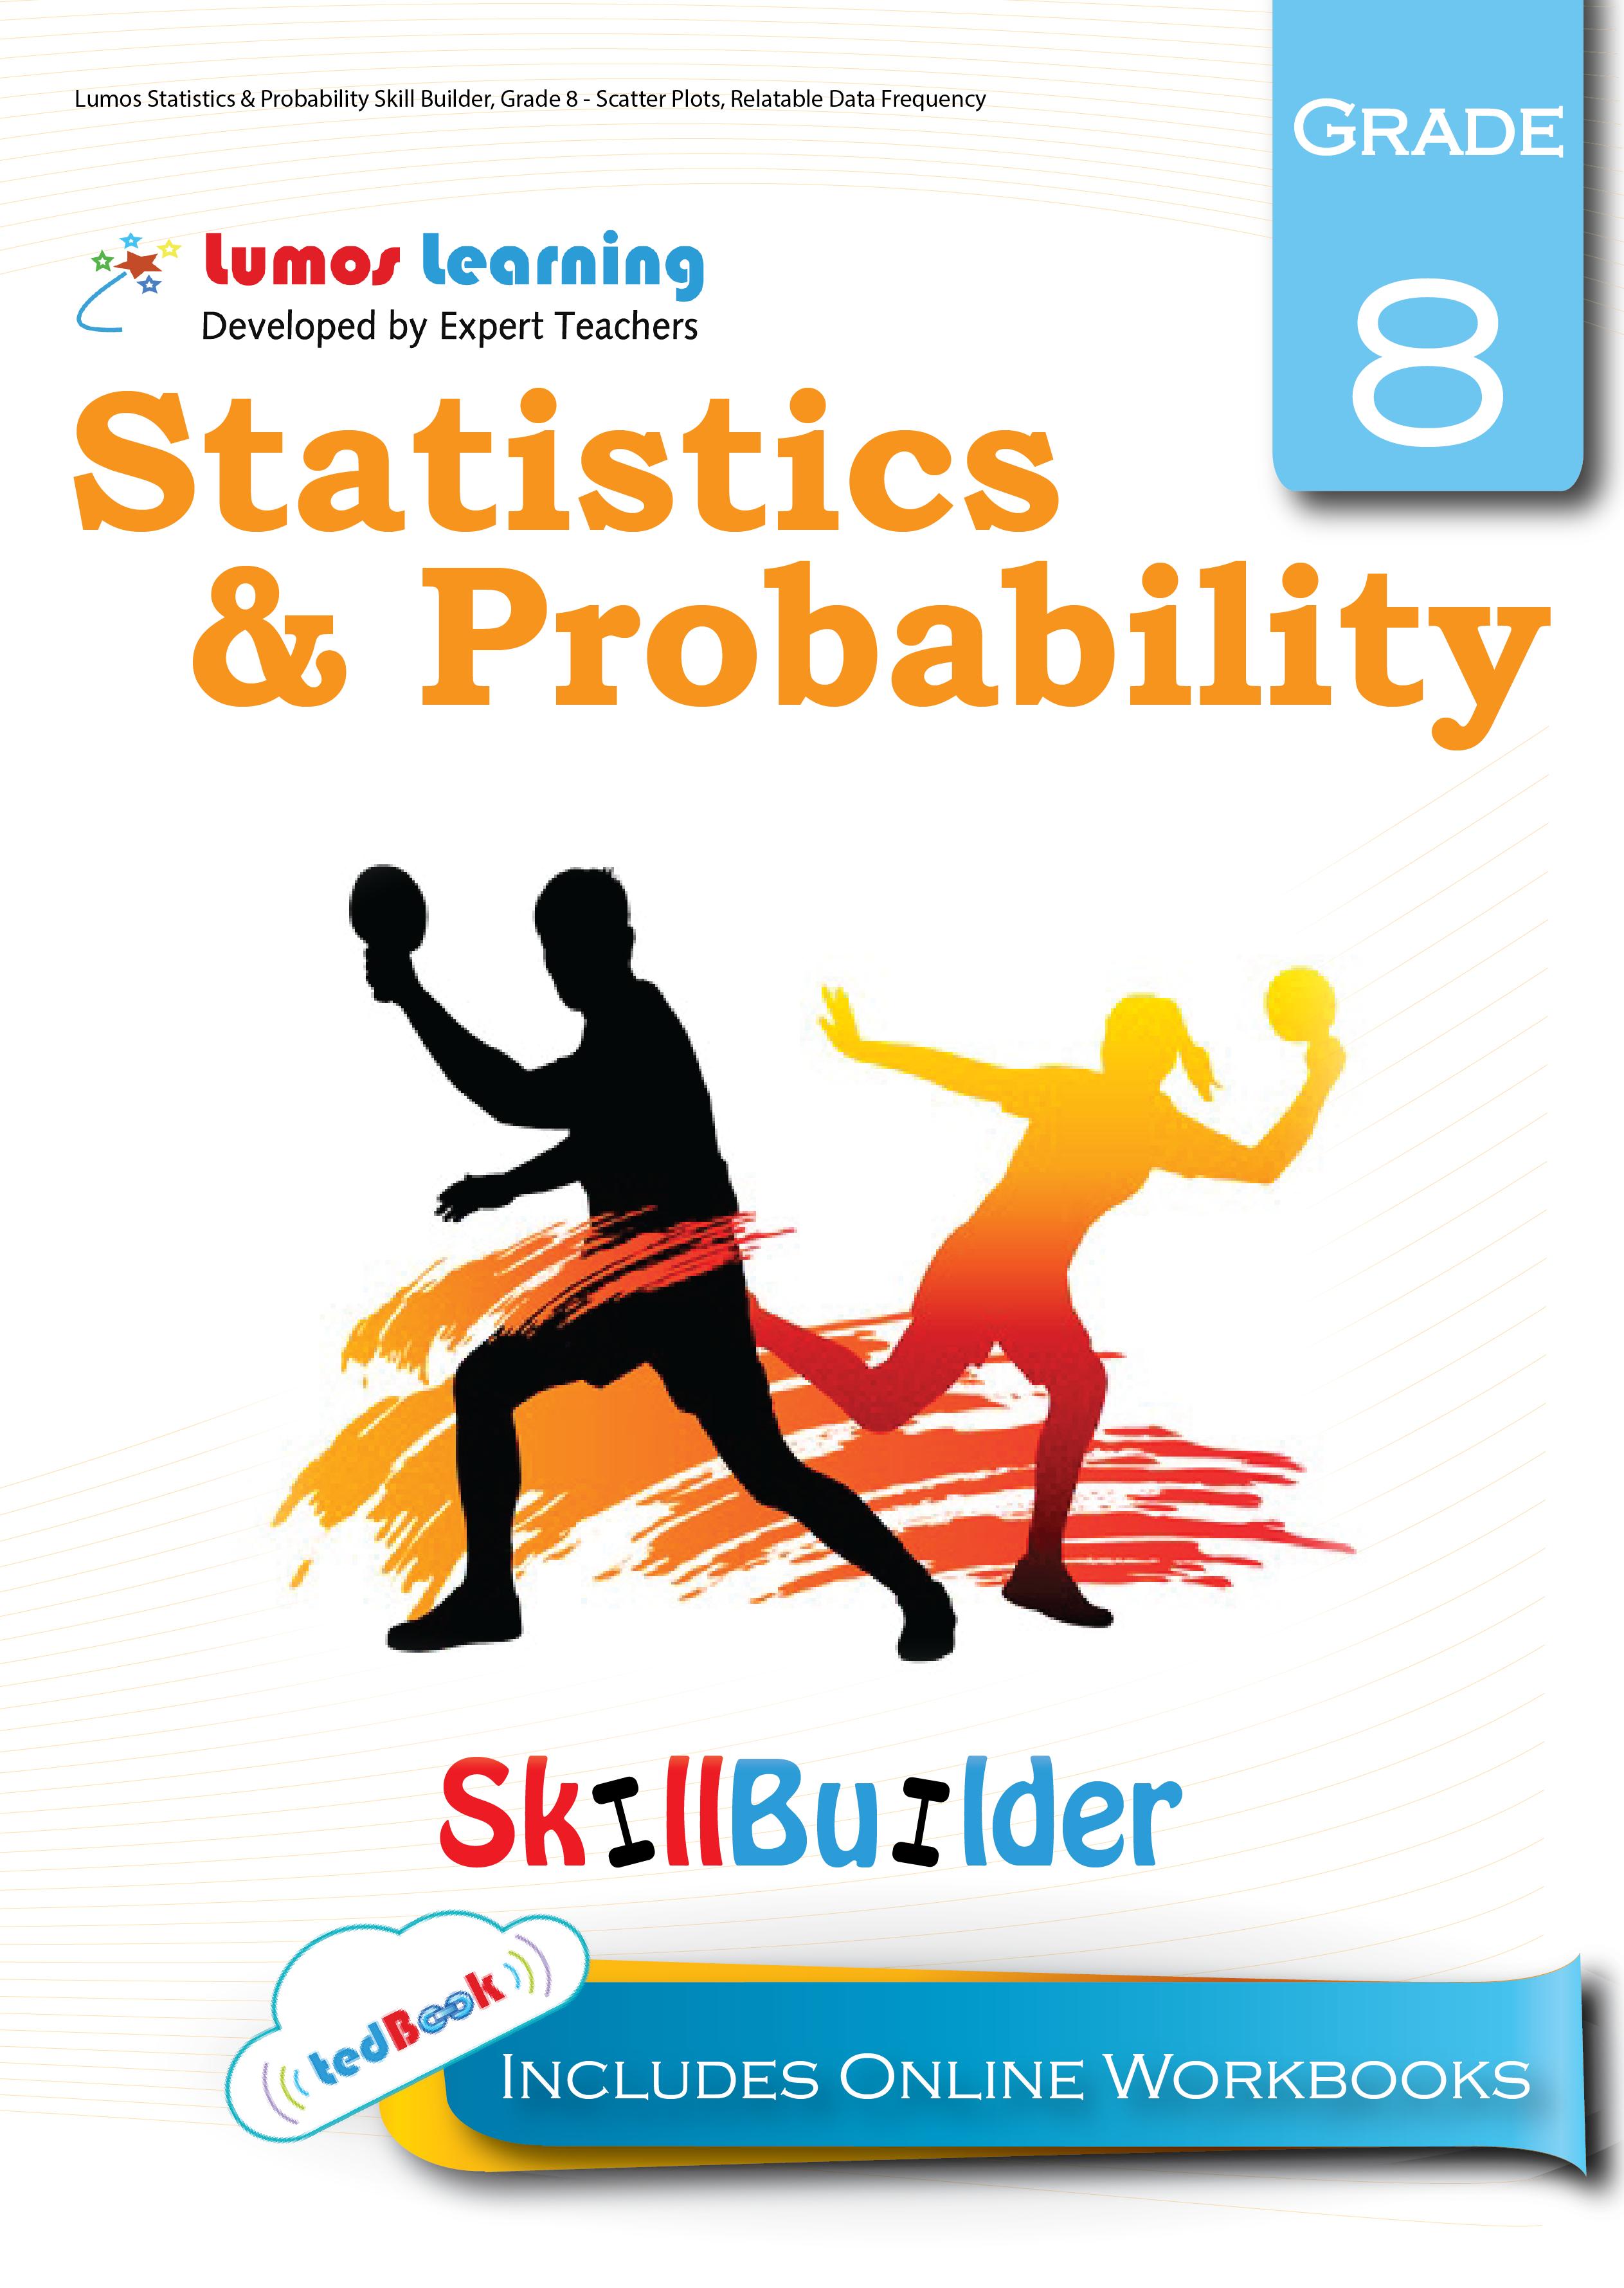 Statistics and Probability grade 8